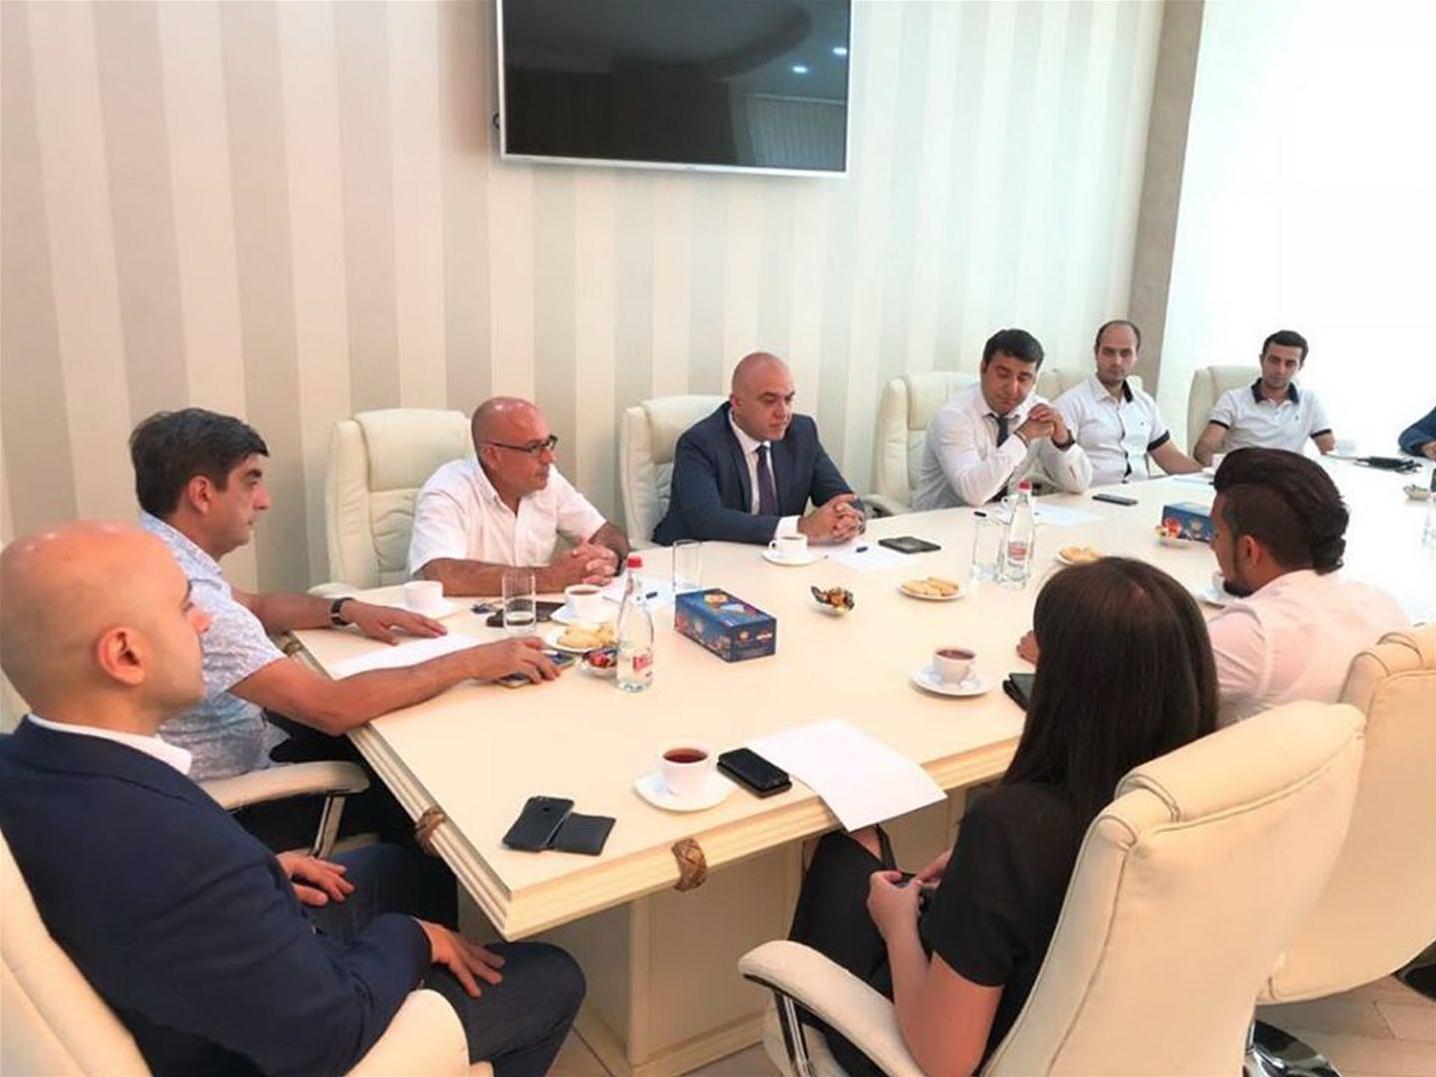 В регионах Азербайджана будут туристические экологические маршруты